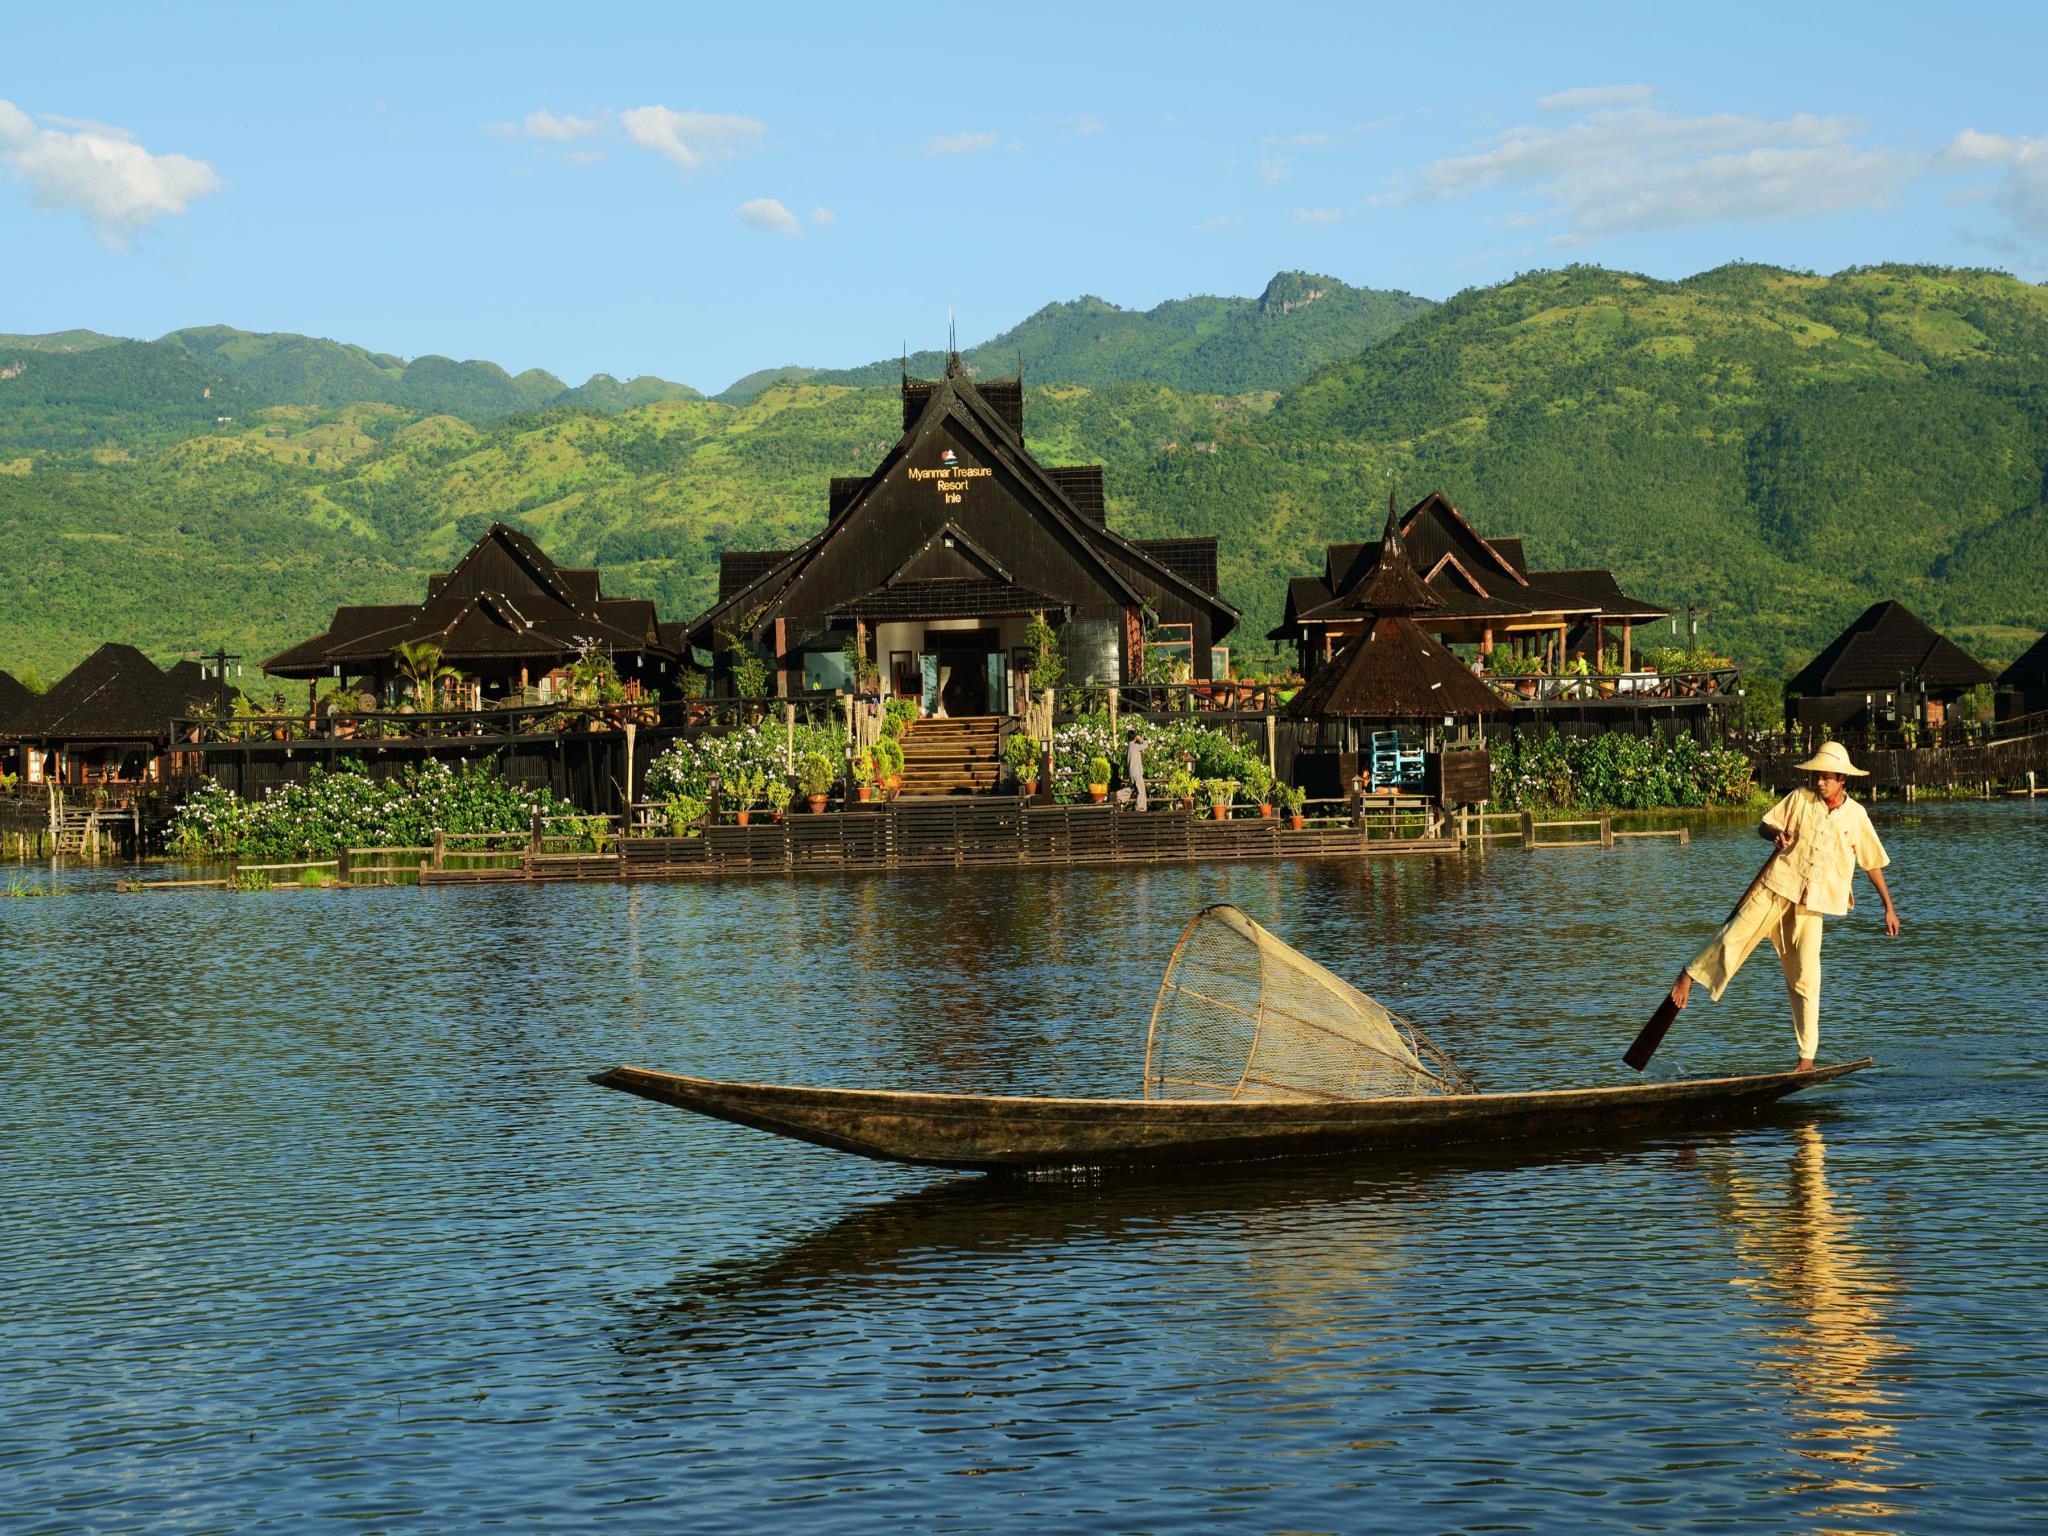 【緬甸】緬甸珍寶度假村 (Myanmar Treasure Resort)   Agoda訂房優惠